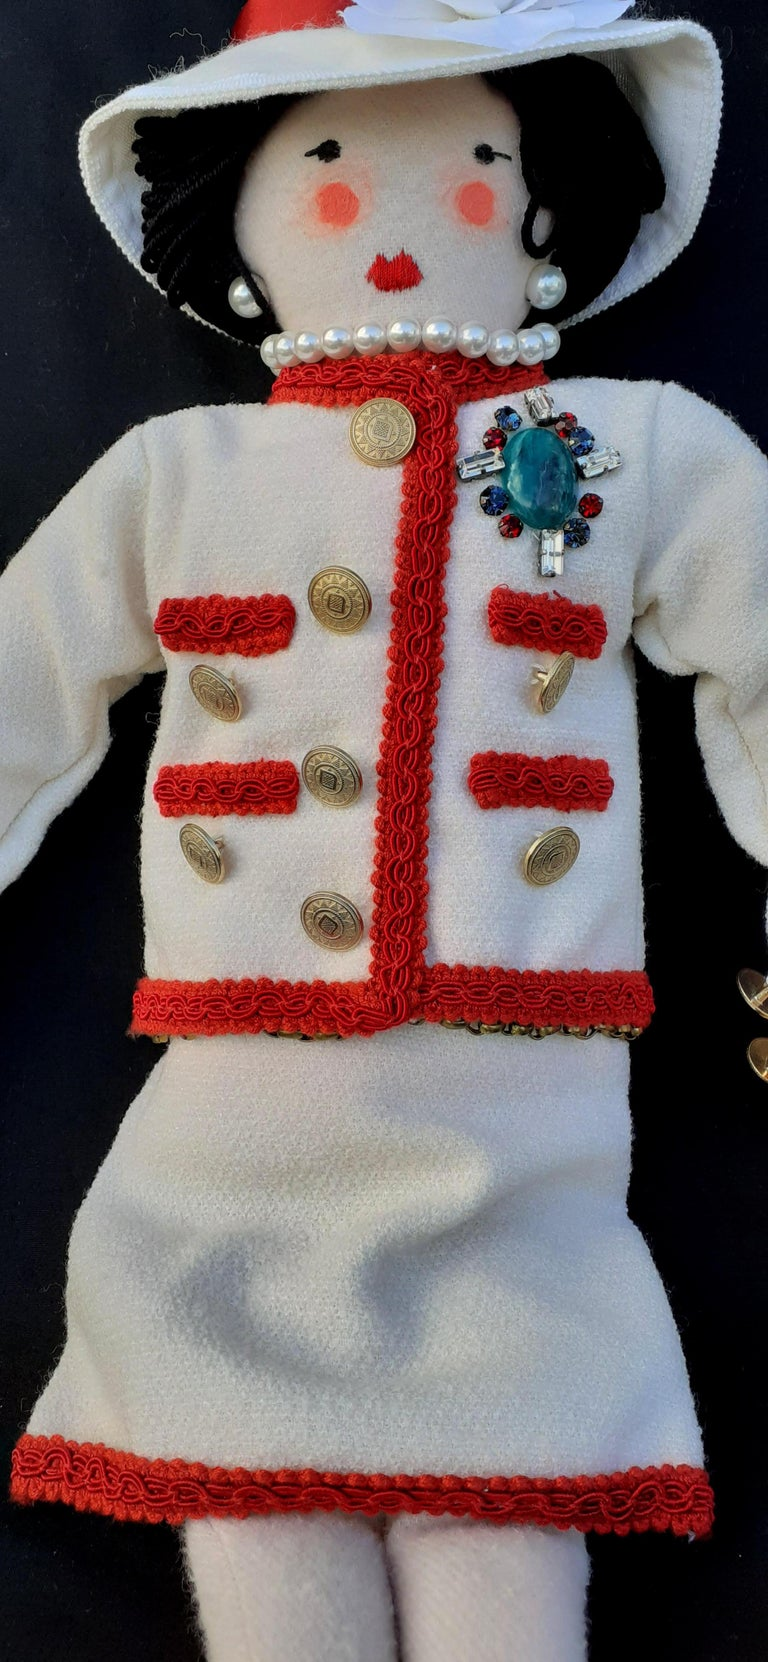 Gabrielle Chanel La Petite Coco Doll Limited Edition 2010 Chanel Shop Windows For Sale 4